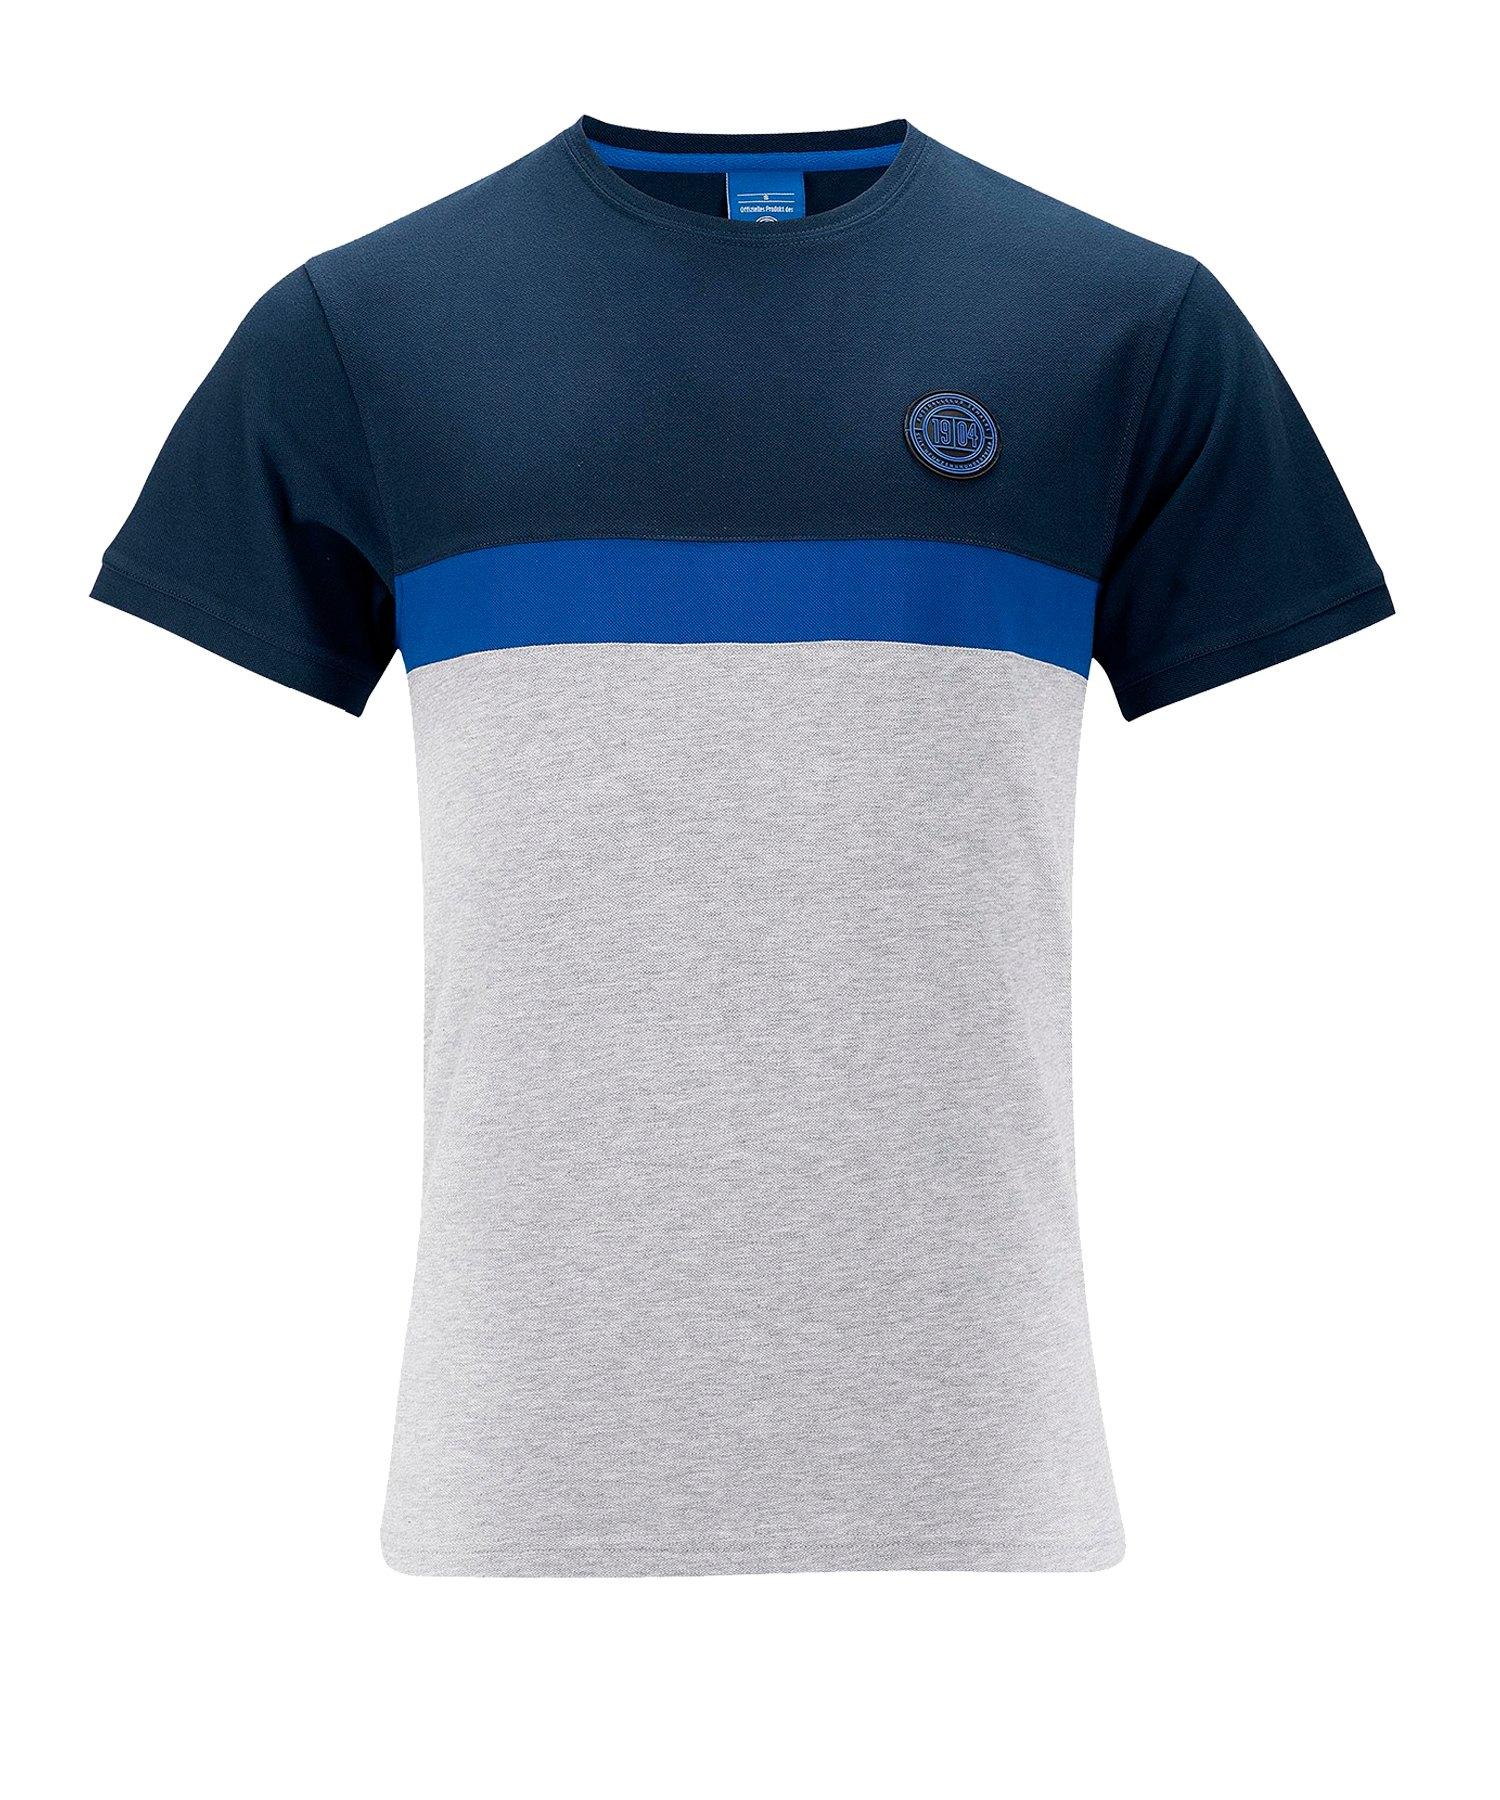 FC Schalke 04 Block Tee T-Shirt Blau - blau